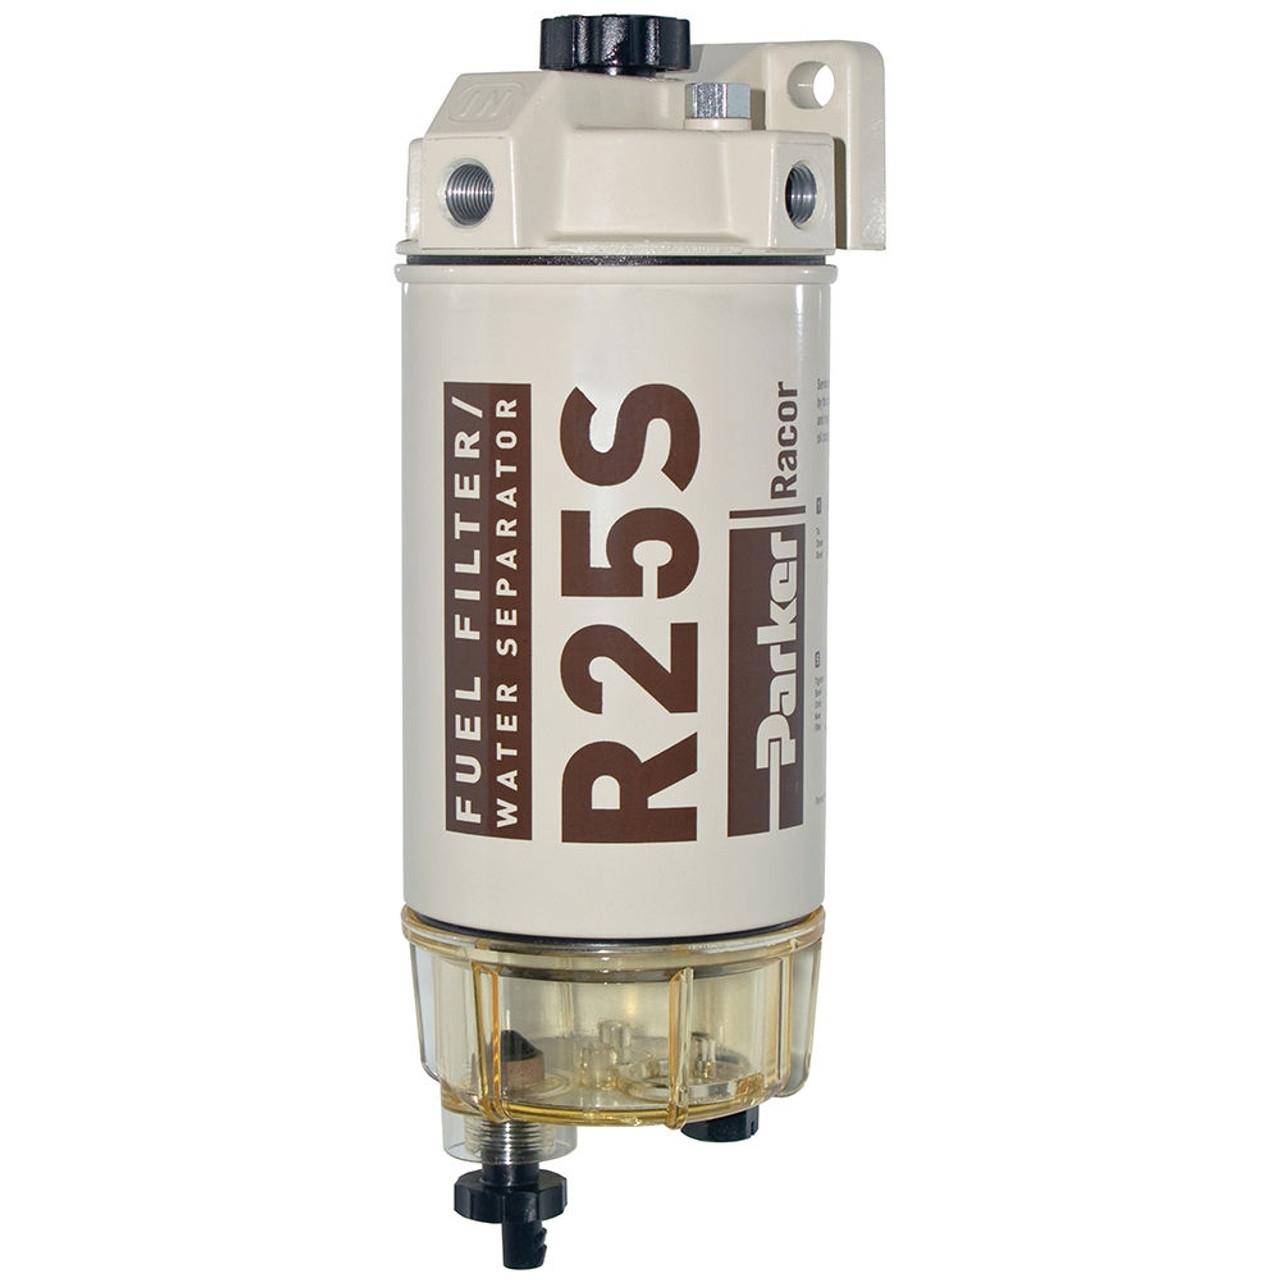 racor 200 series 45 gph low flow diesel fuel filter water separator 245 filter assembly [ 1000 x 1000 Pixel ]